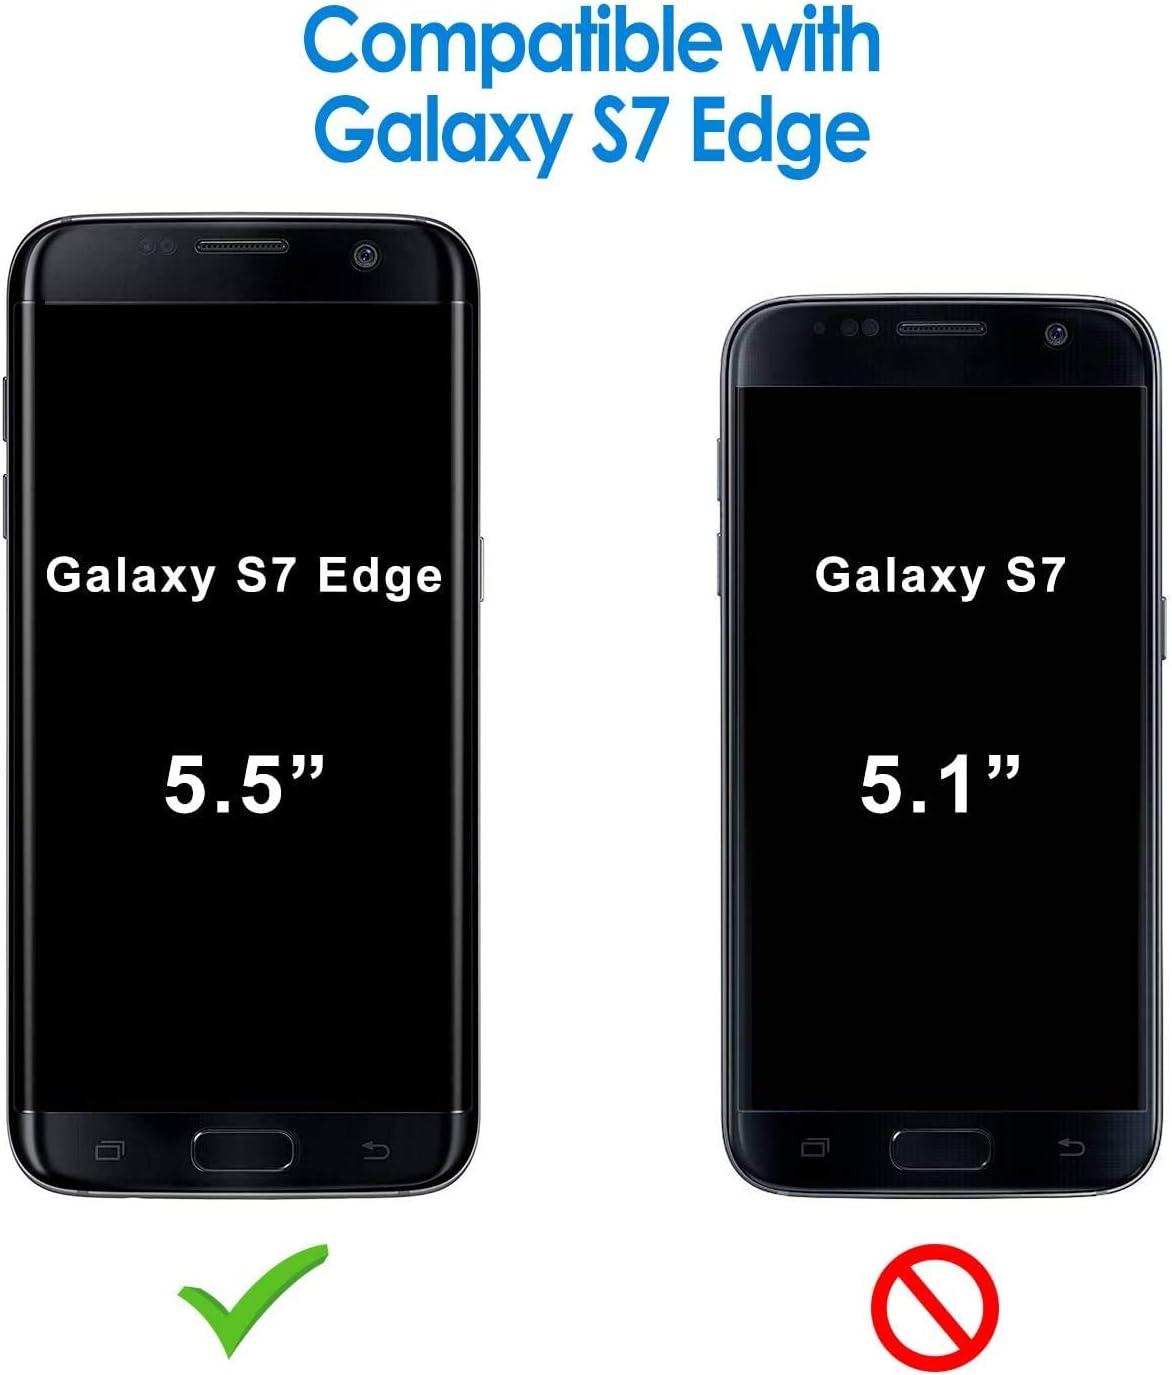 LeYi Compatible with Funda Samsung Galaxy S7 Edge Silicona Purpurina Carcasa con [2-Unidades] 3D Curvo Pet Pantalla,Transparente Cristal Bumper Telefono Fundas Case Cover para Movil S7 Edge Verde: Amazon.es: Electrónica